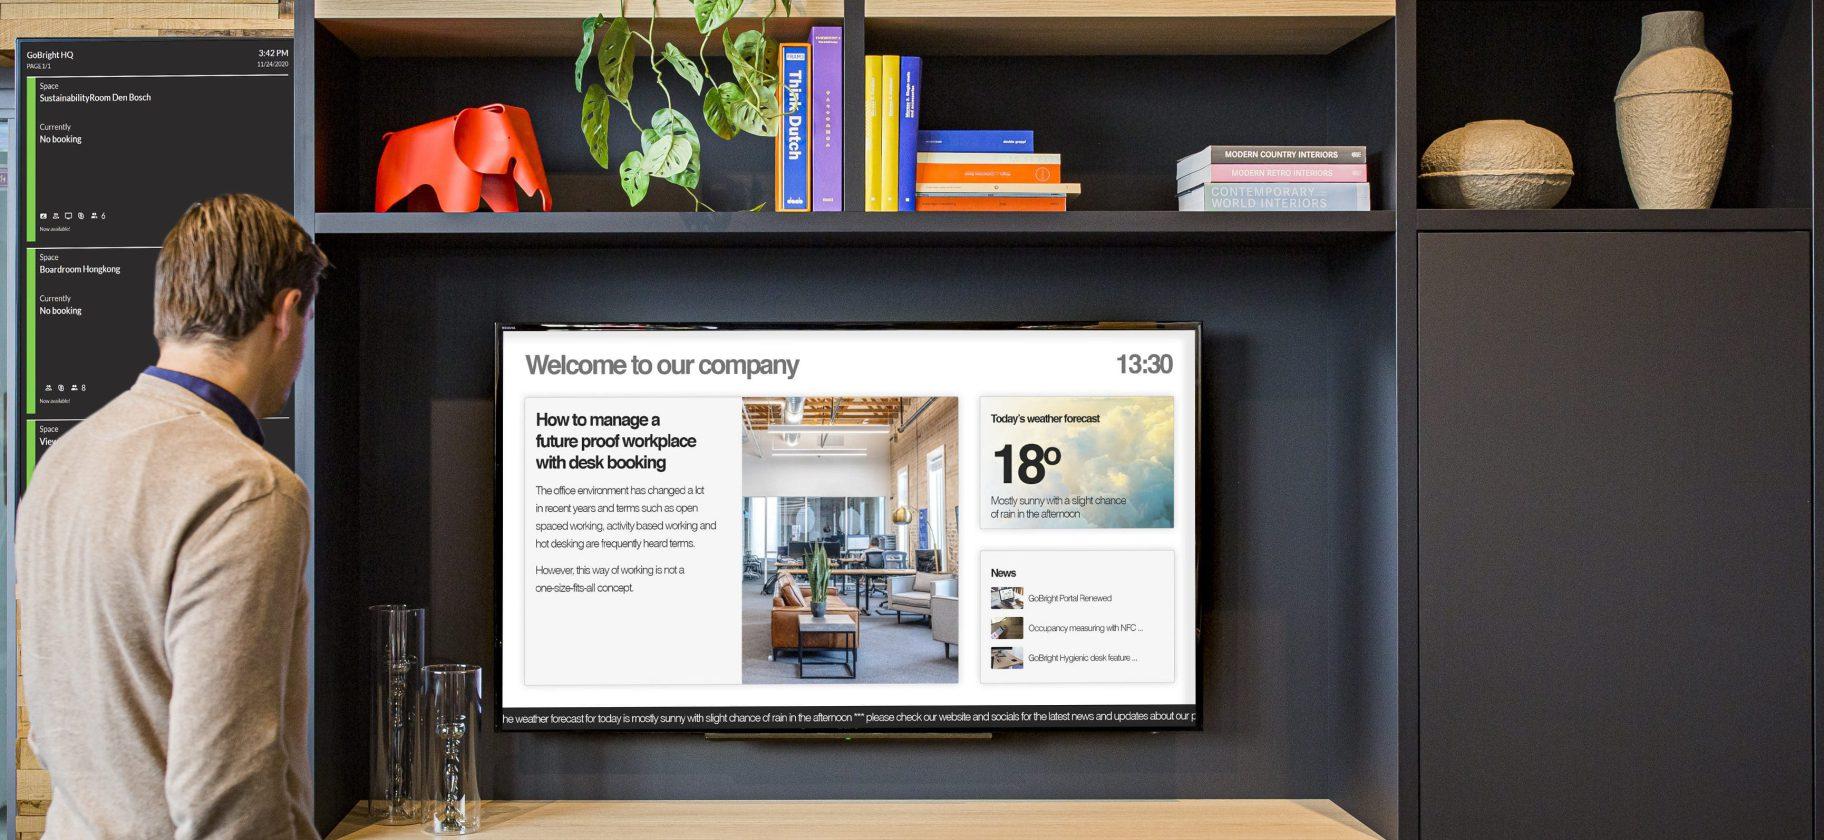 GoBright View - Digital Signage - Narrowcasting